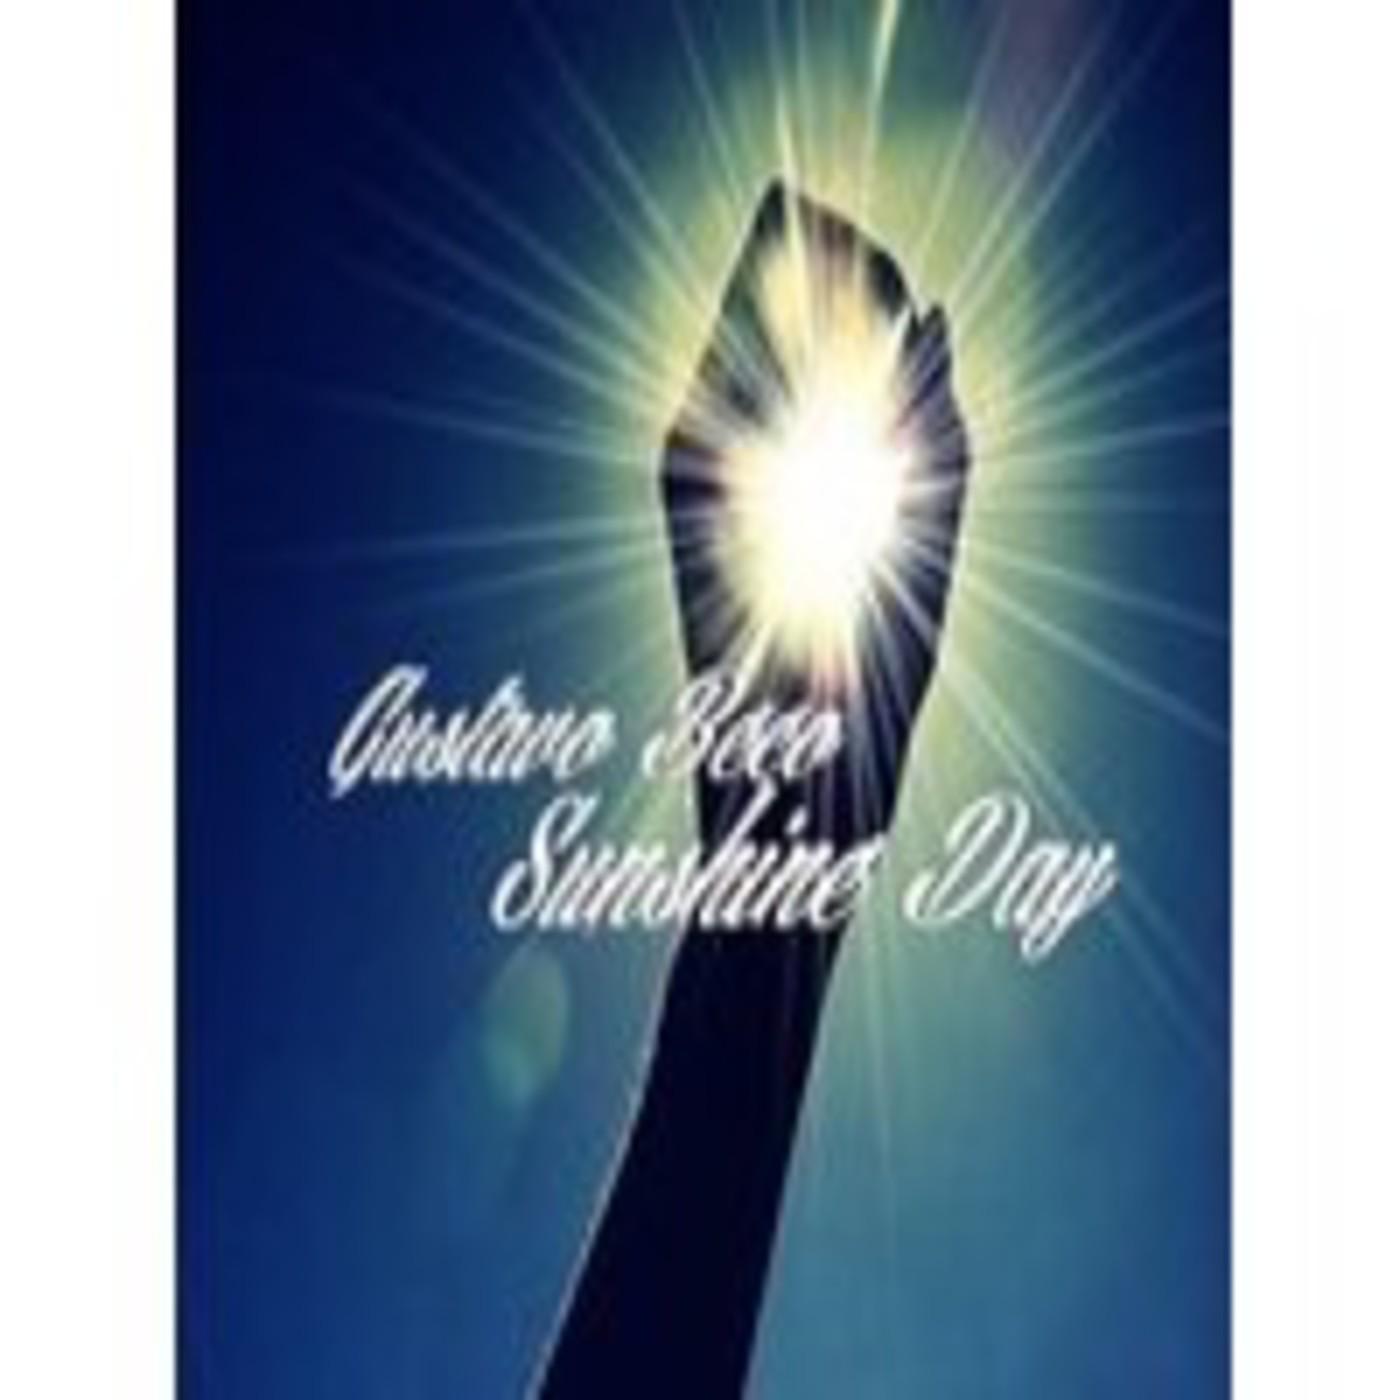 Gustavo Beco Presents Sunshine Day Episode 004